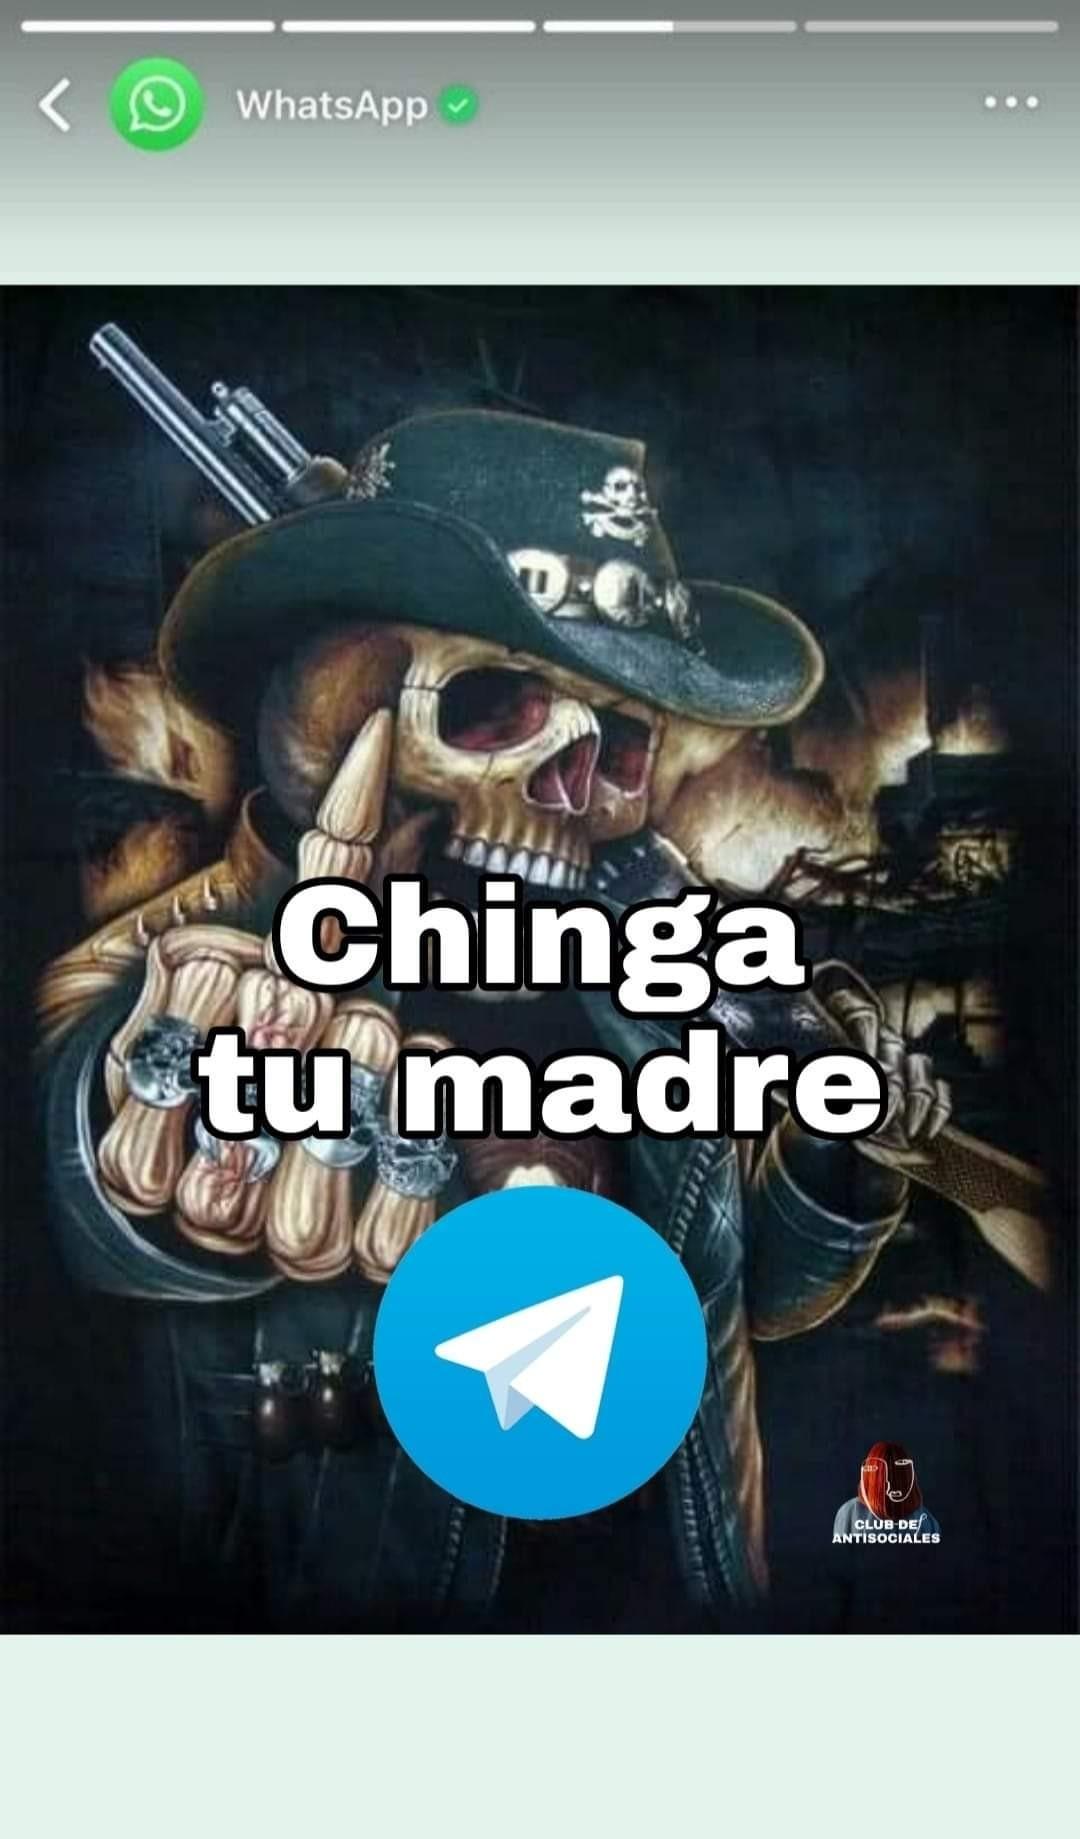 Anda raro el WhatsApp - meme